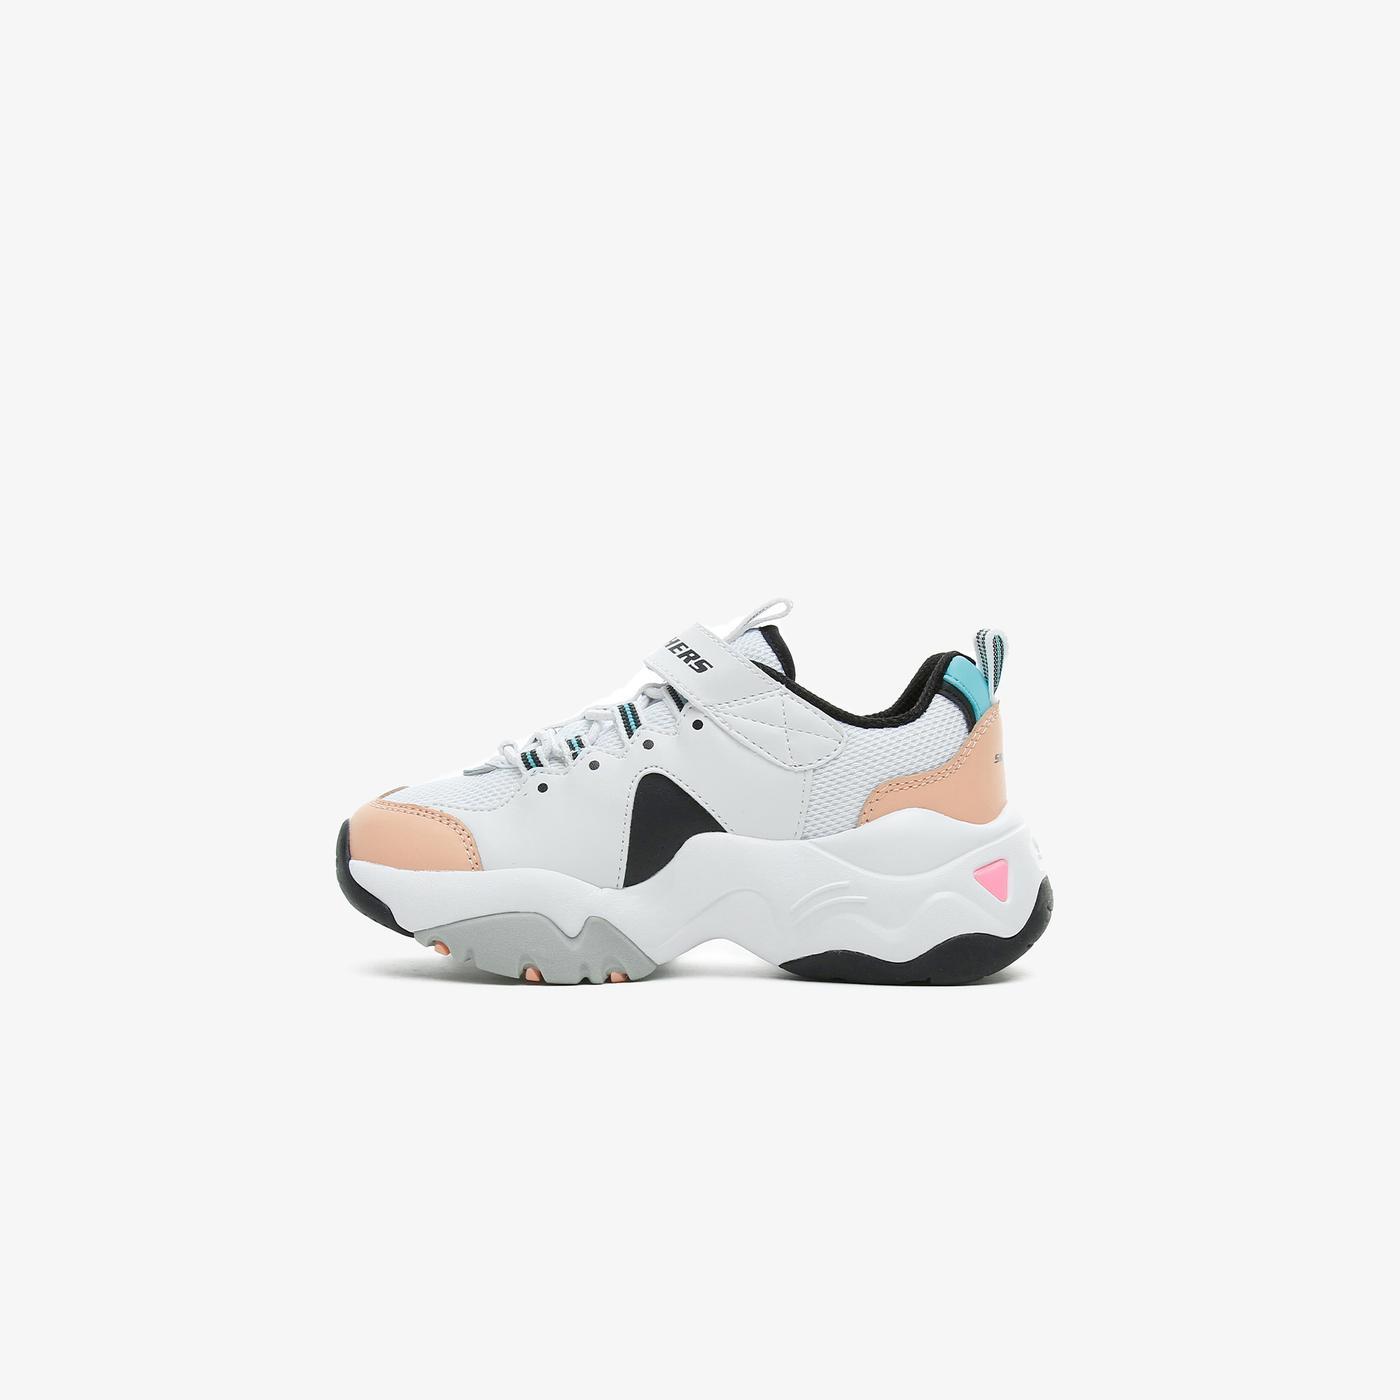 Skechers D'Lites 3.0 - Zenway ii Çocuk Beyaz Spor Ayakkabı